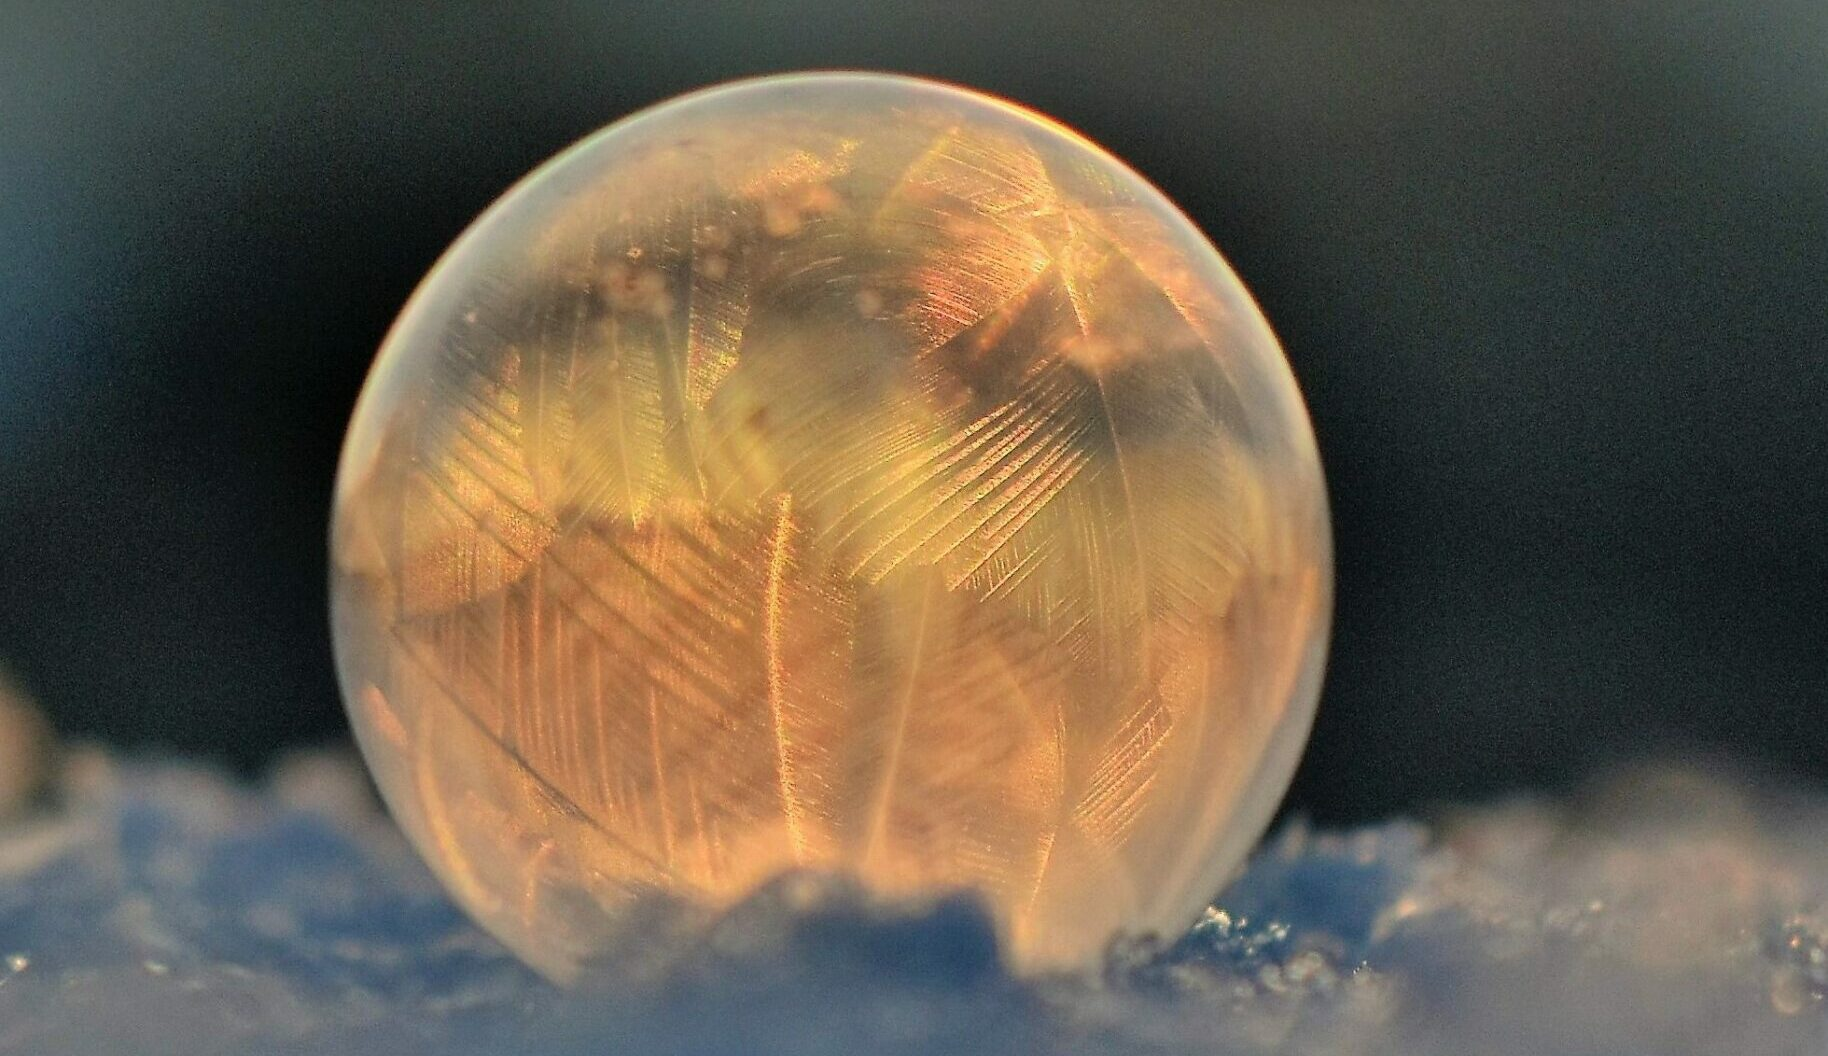 frozen-soap-bubble-against-sky-during-sunset